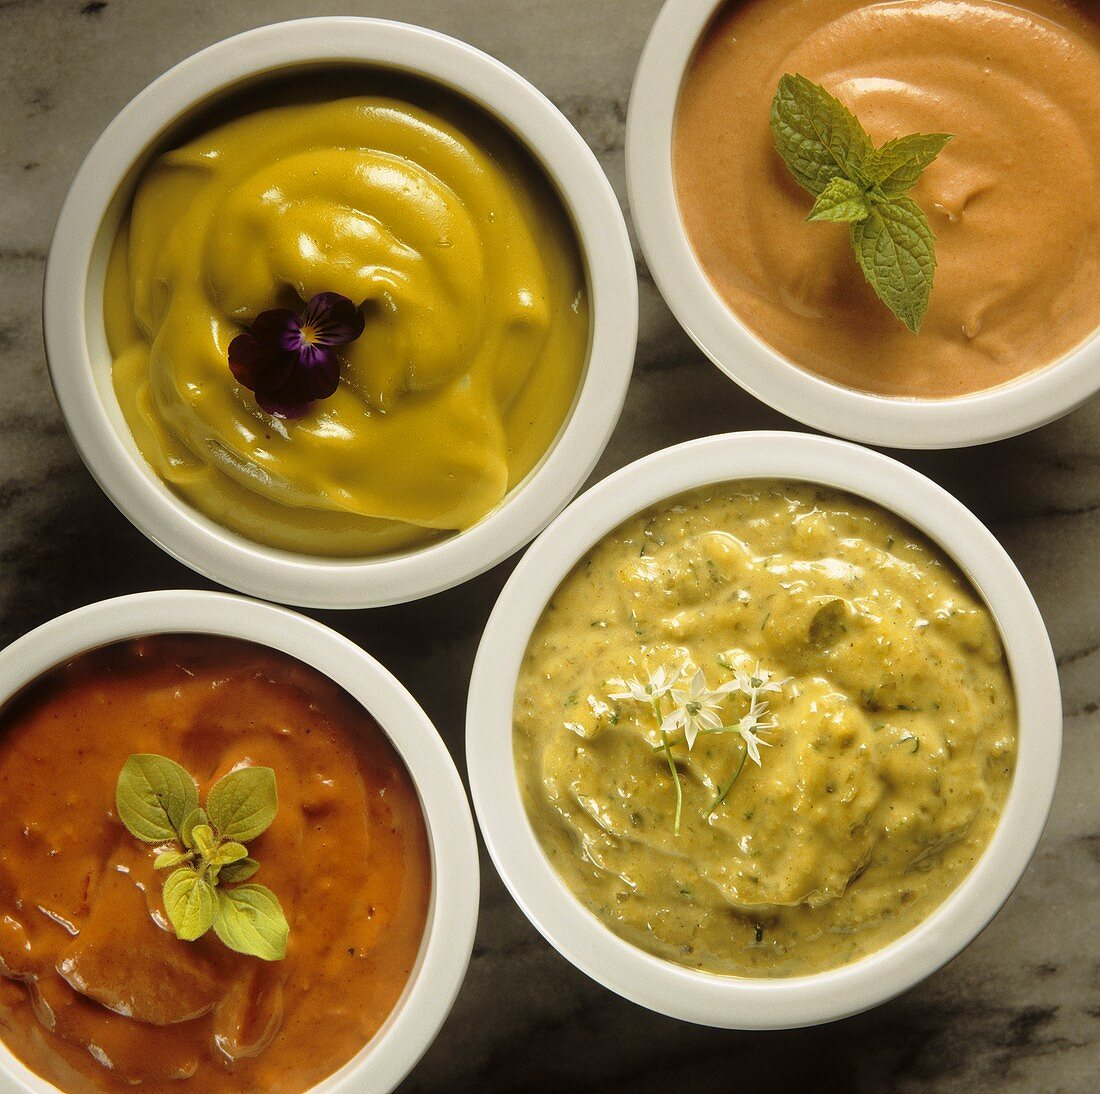 Cocktail sauce, mustard sauce, herb sauce & tomato sauce